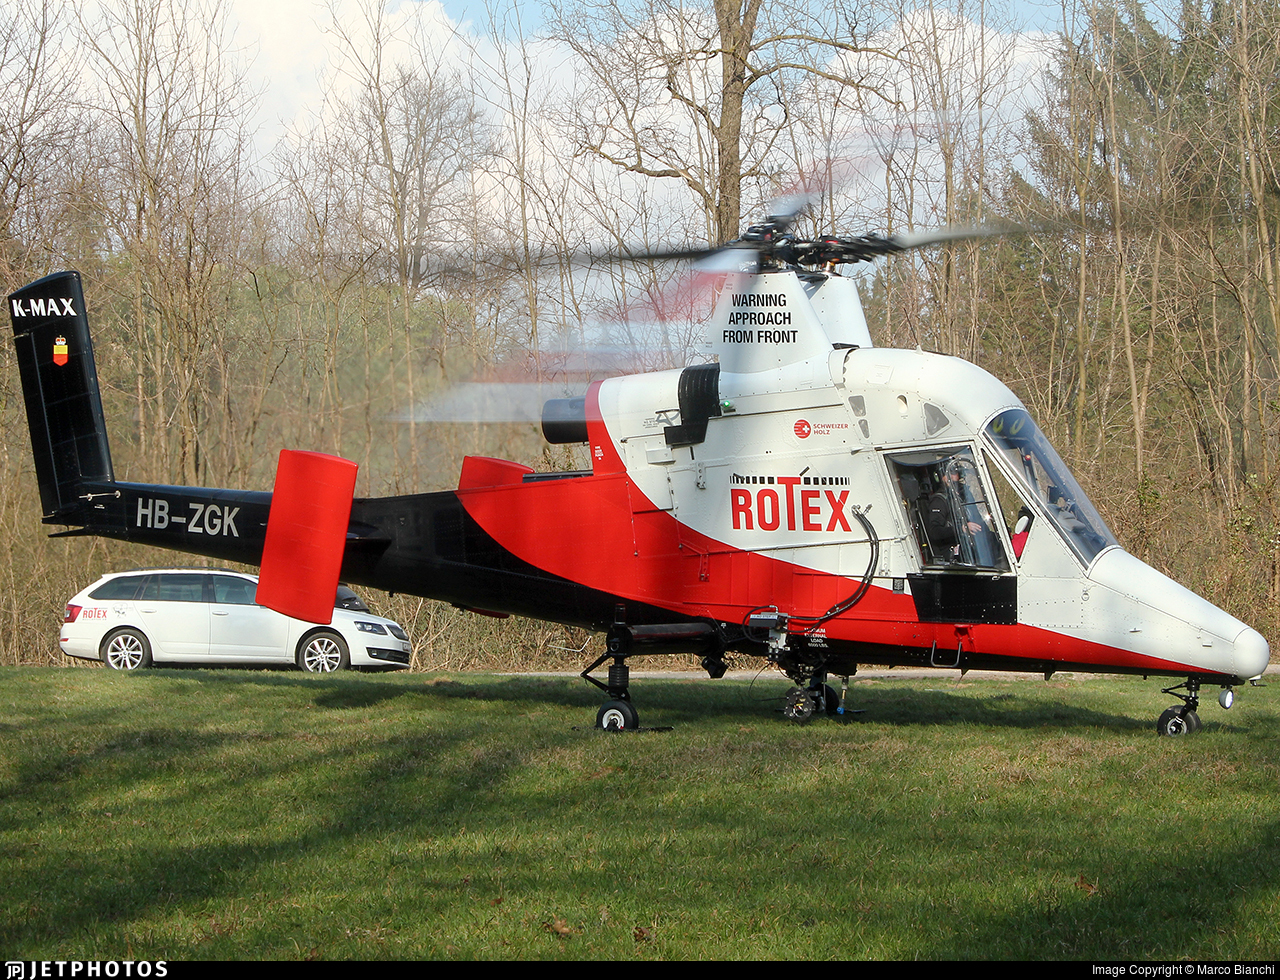 HB-ZGK - Kaman K-1200 K-Max - Rotex Helikopter